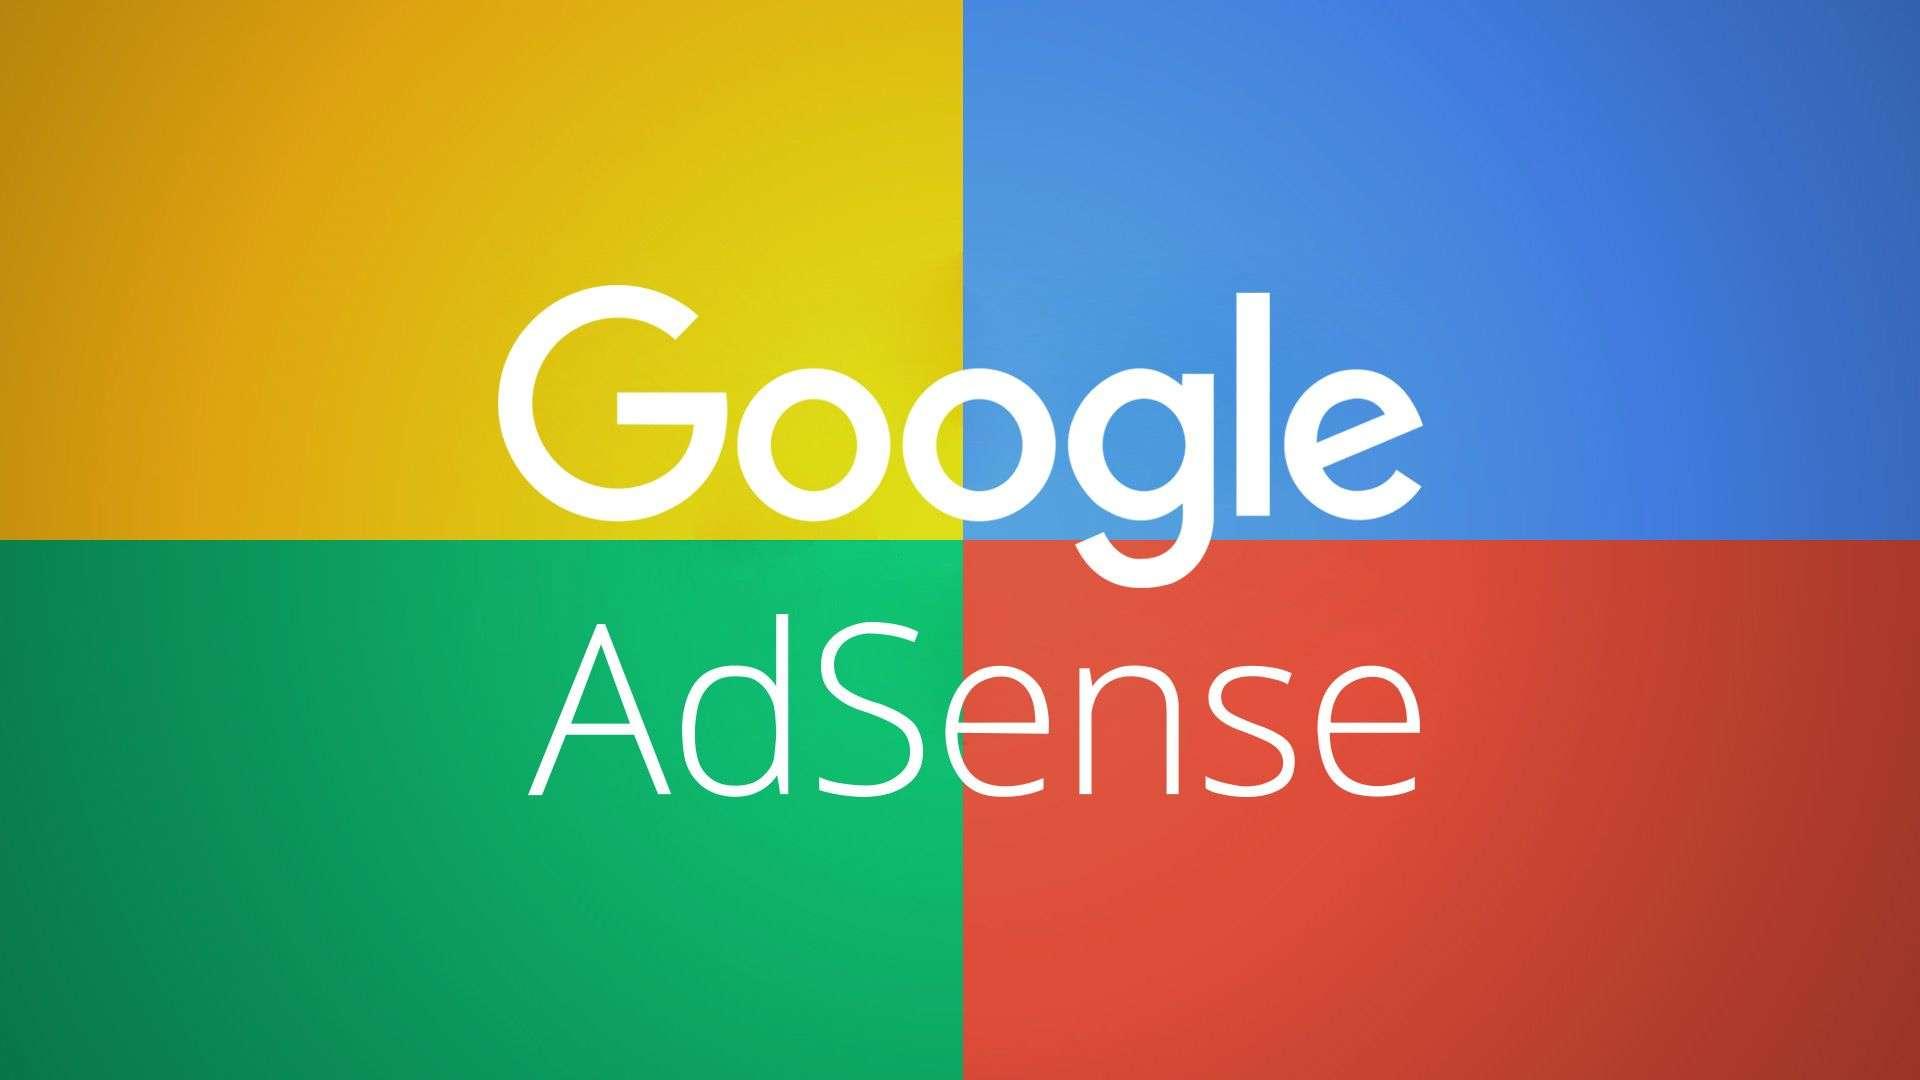 adsense-publishers